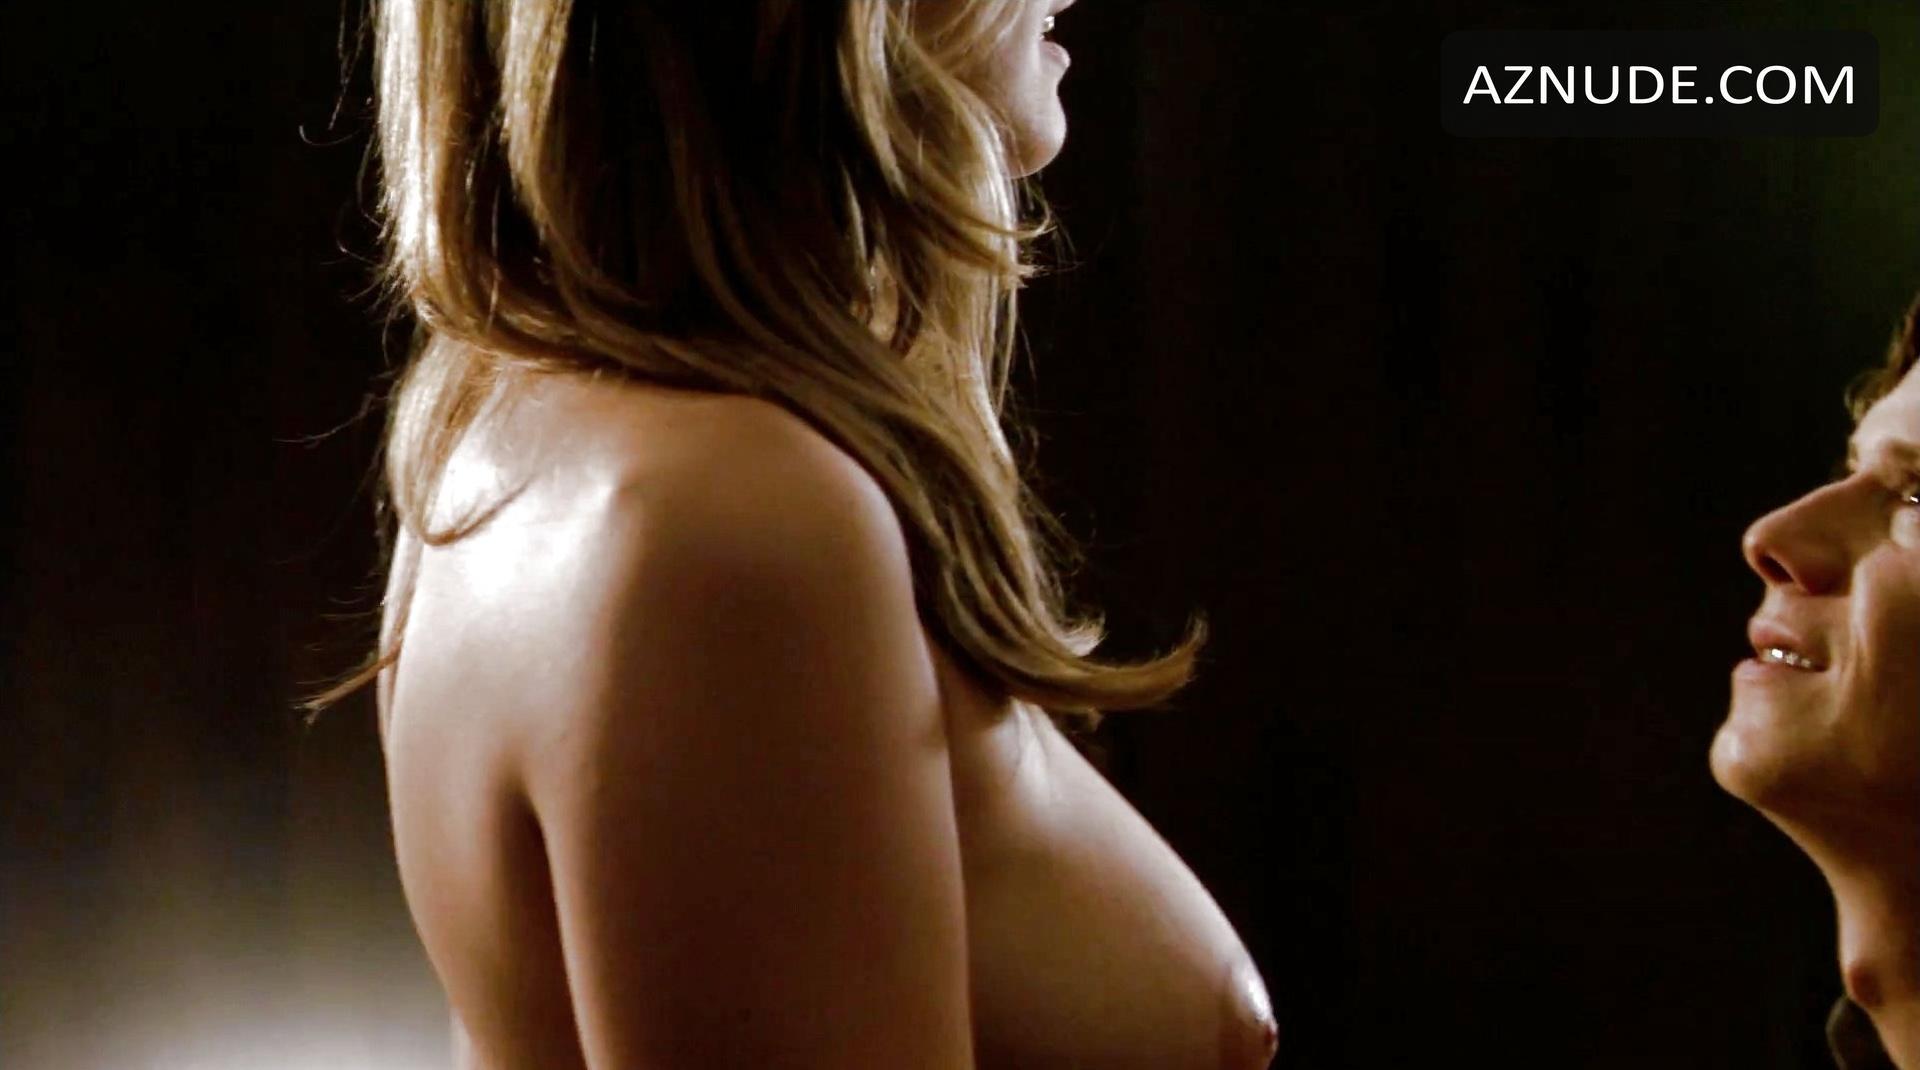 Bikini model academy 2015 mindy robinson - 4 1